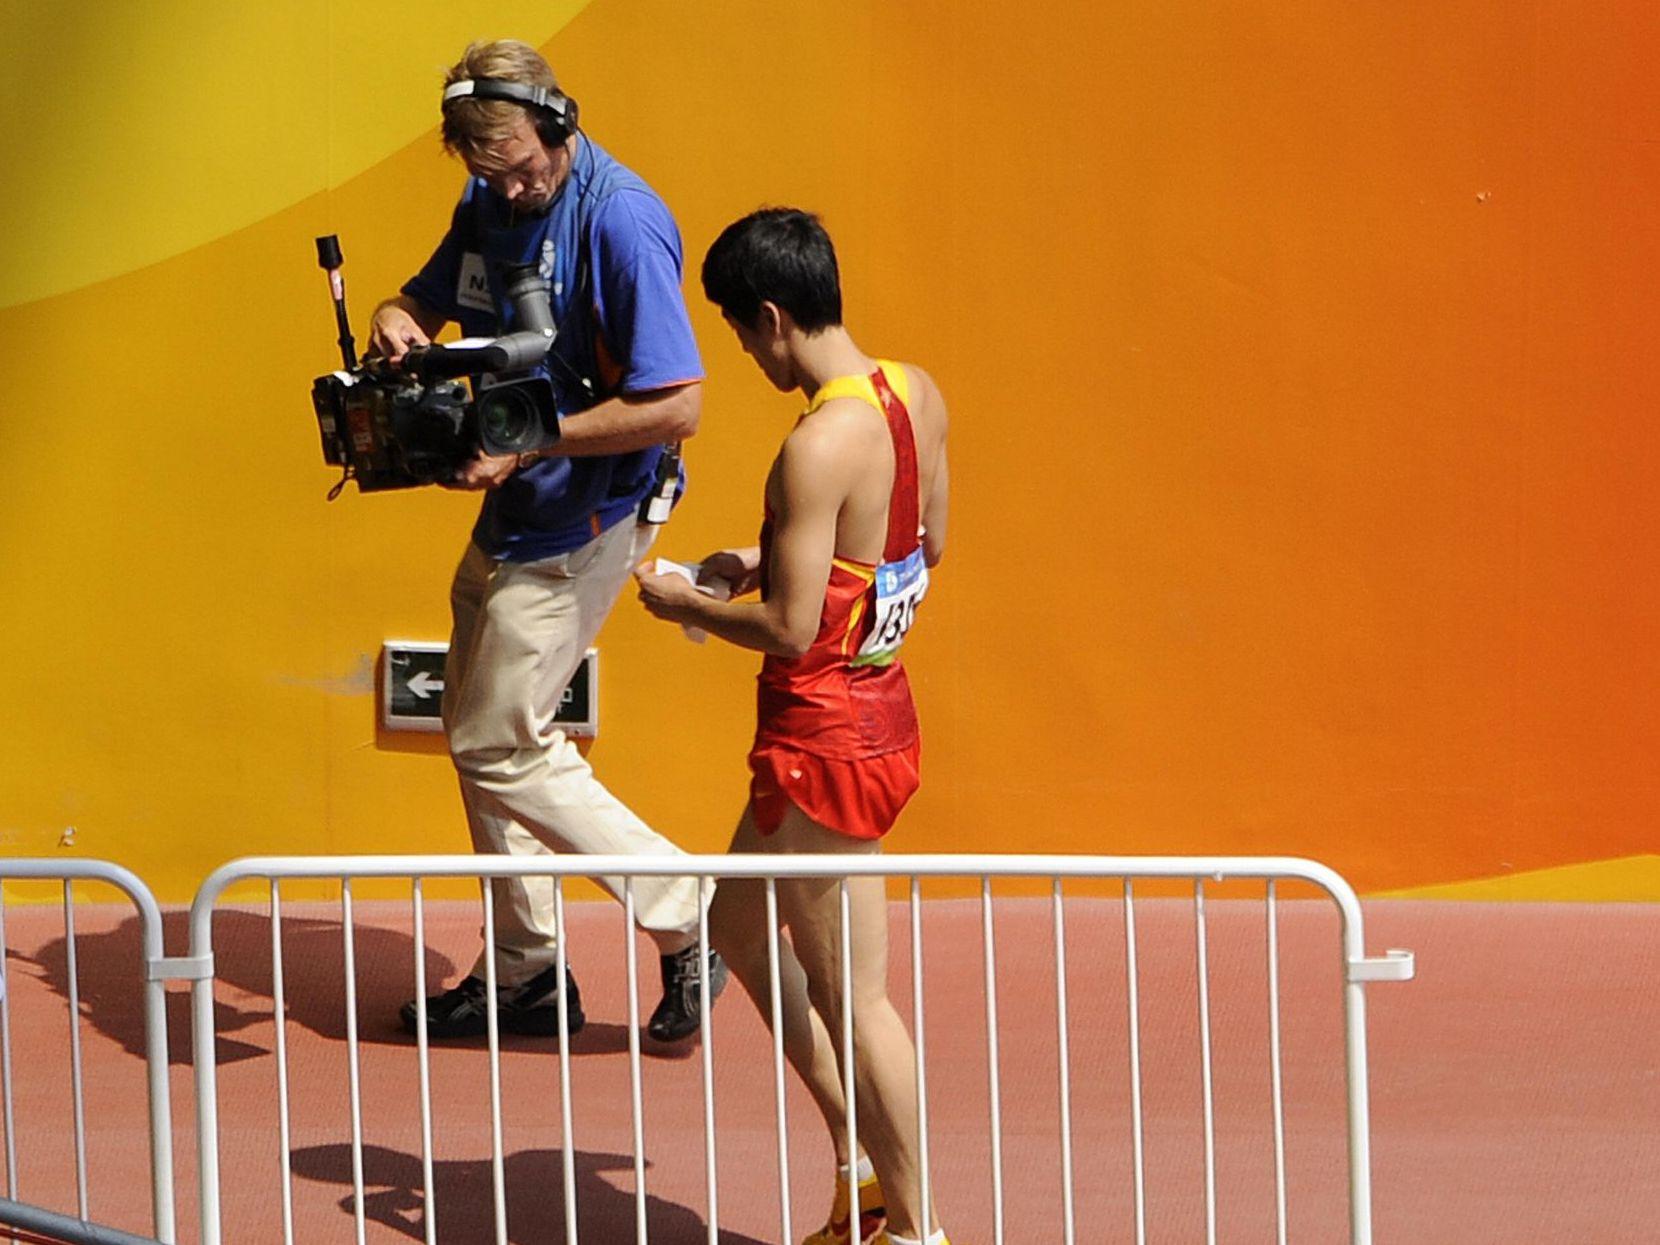 Hürdenläufer Liu Xiang – Opfer der Personenkult-Kampagne